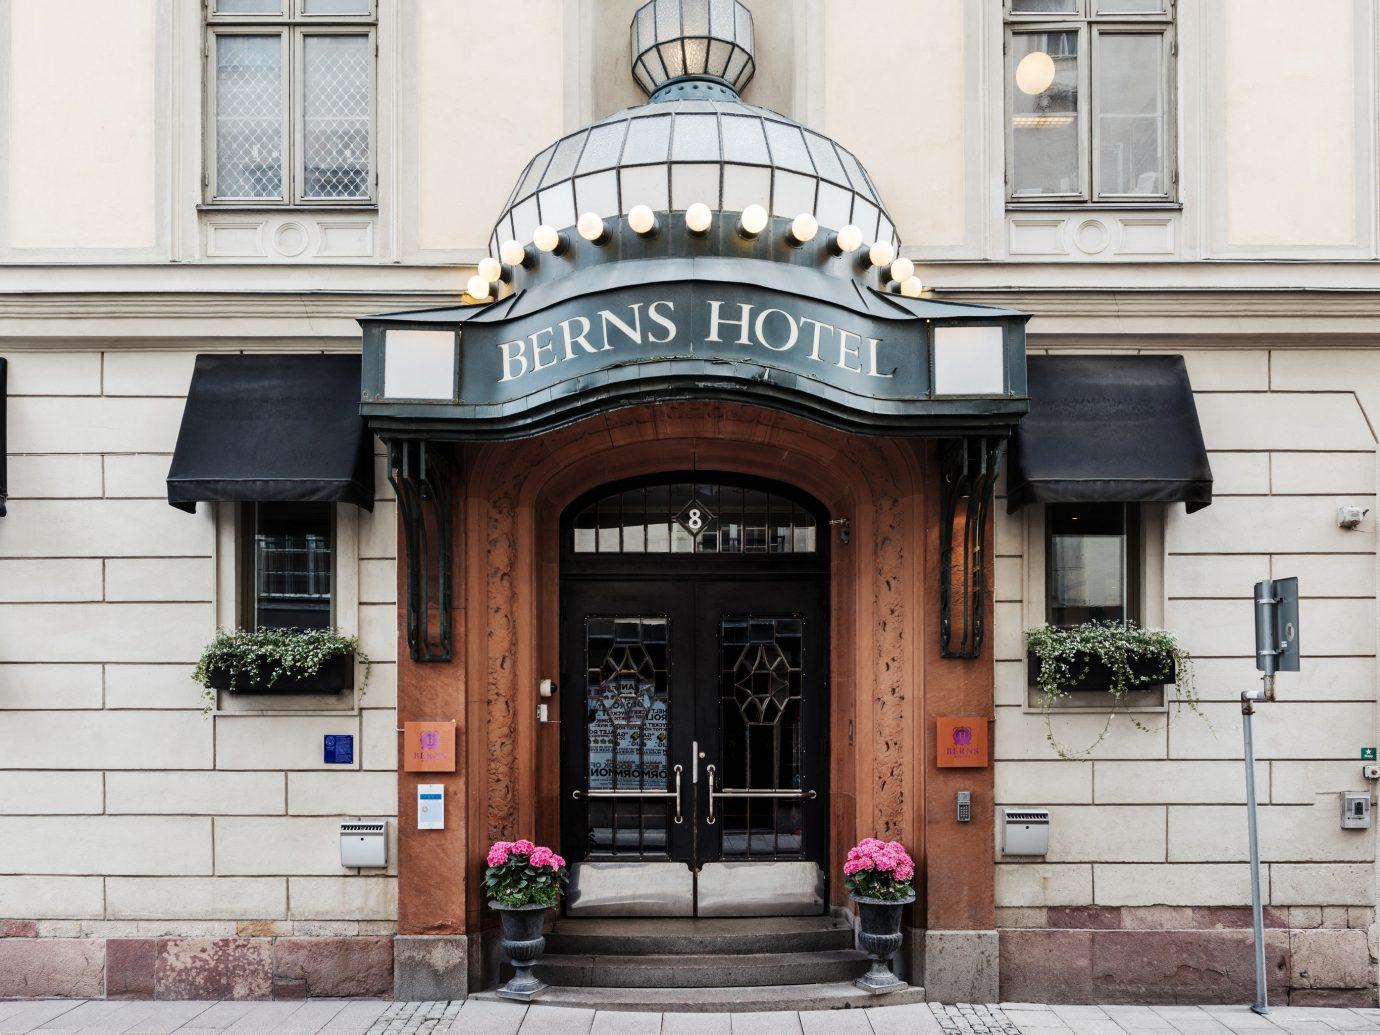 Hotels Stockholm Sweden building outdoor Architecture iron facade door City window house arch